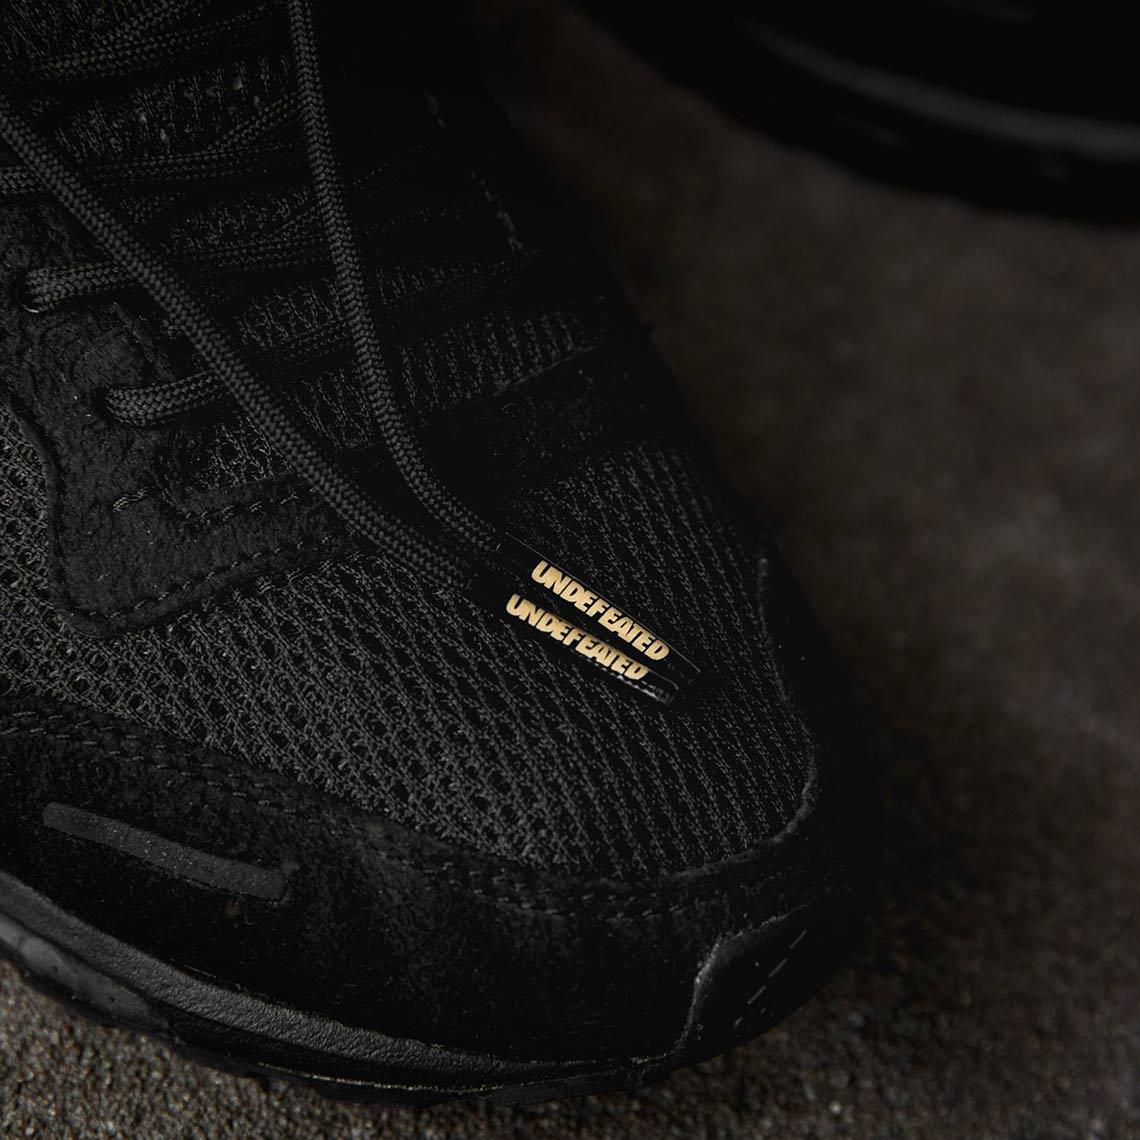 sale retailer 3dce3 03ea2 Where To Buy Adidas adiZero Adios Boost B27771 B22483  Sneak